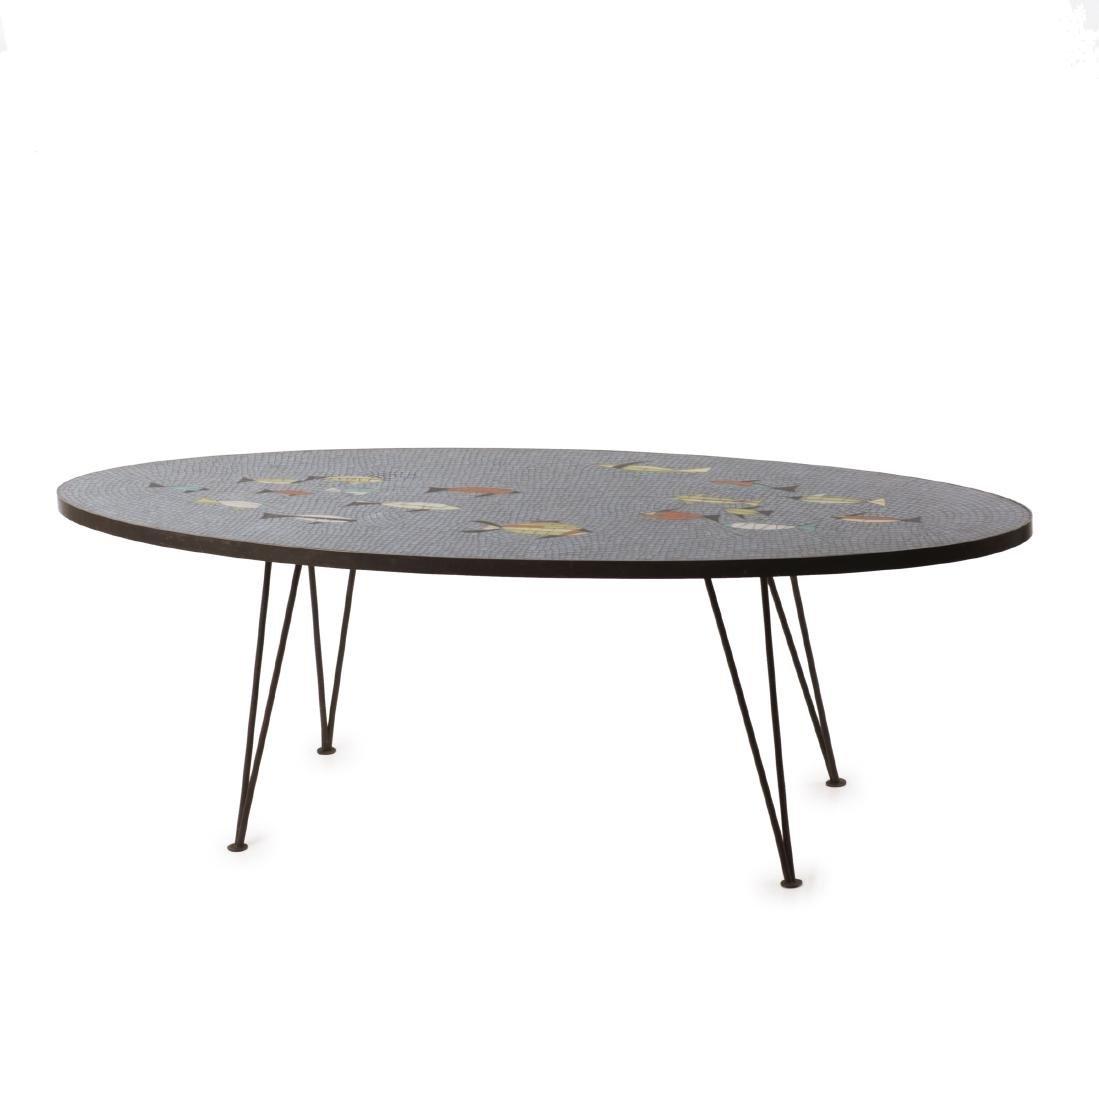 'Fish' coffee table, c1955